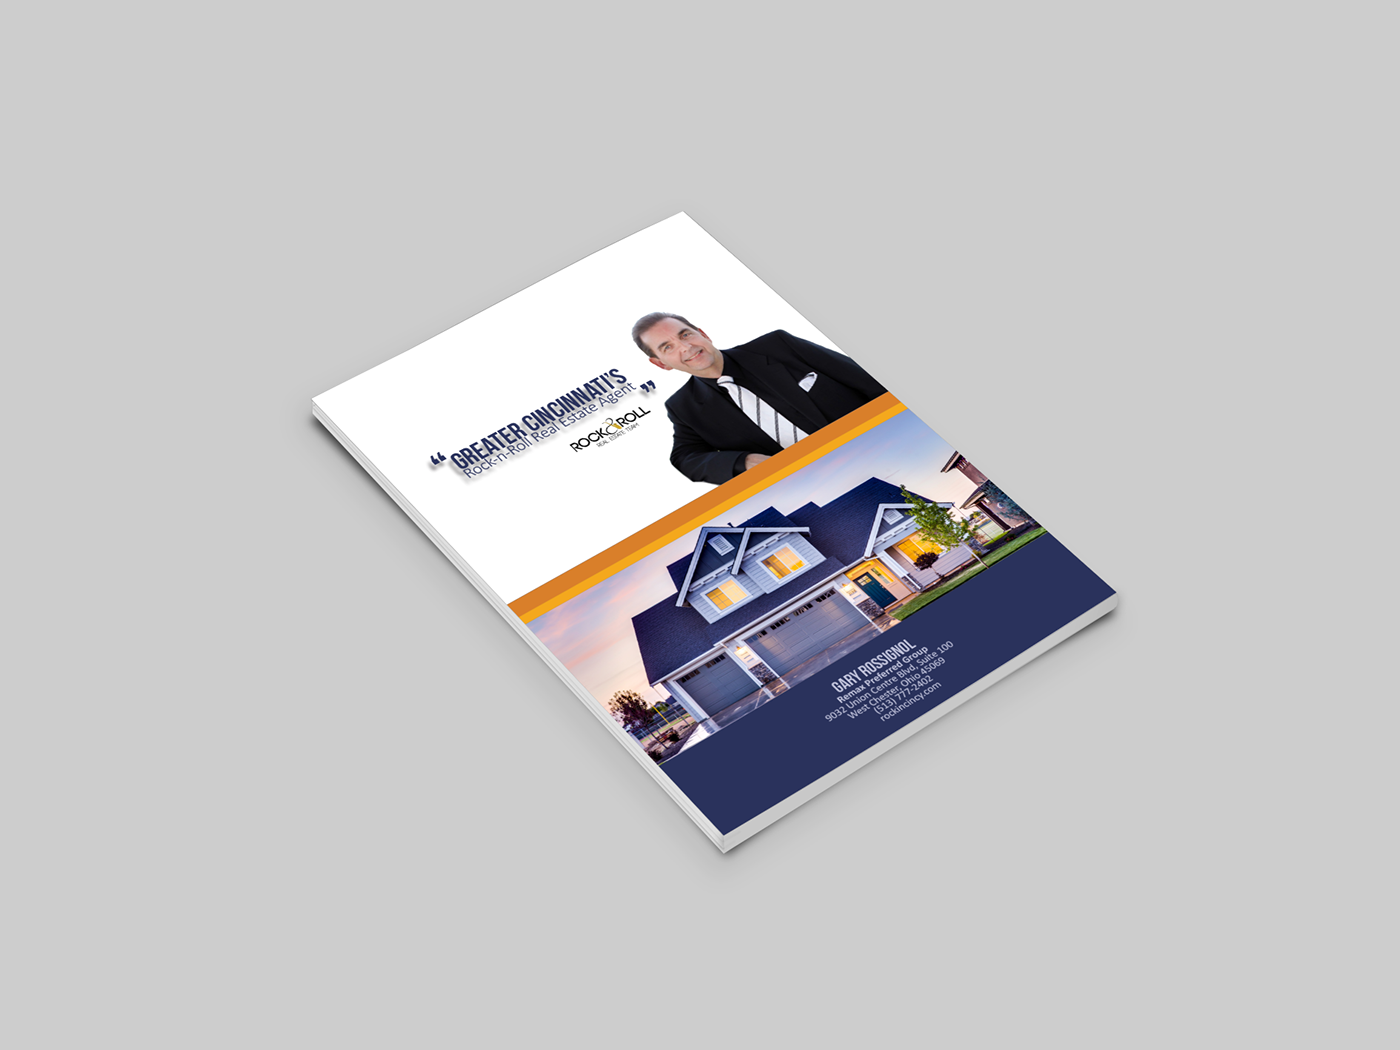 print design  print layout Flyer Design flyers magazine layout photoshop InDesign Illustrator graphic design